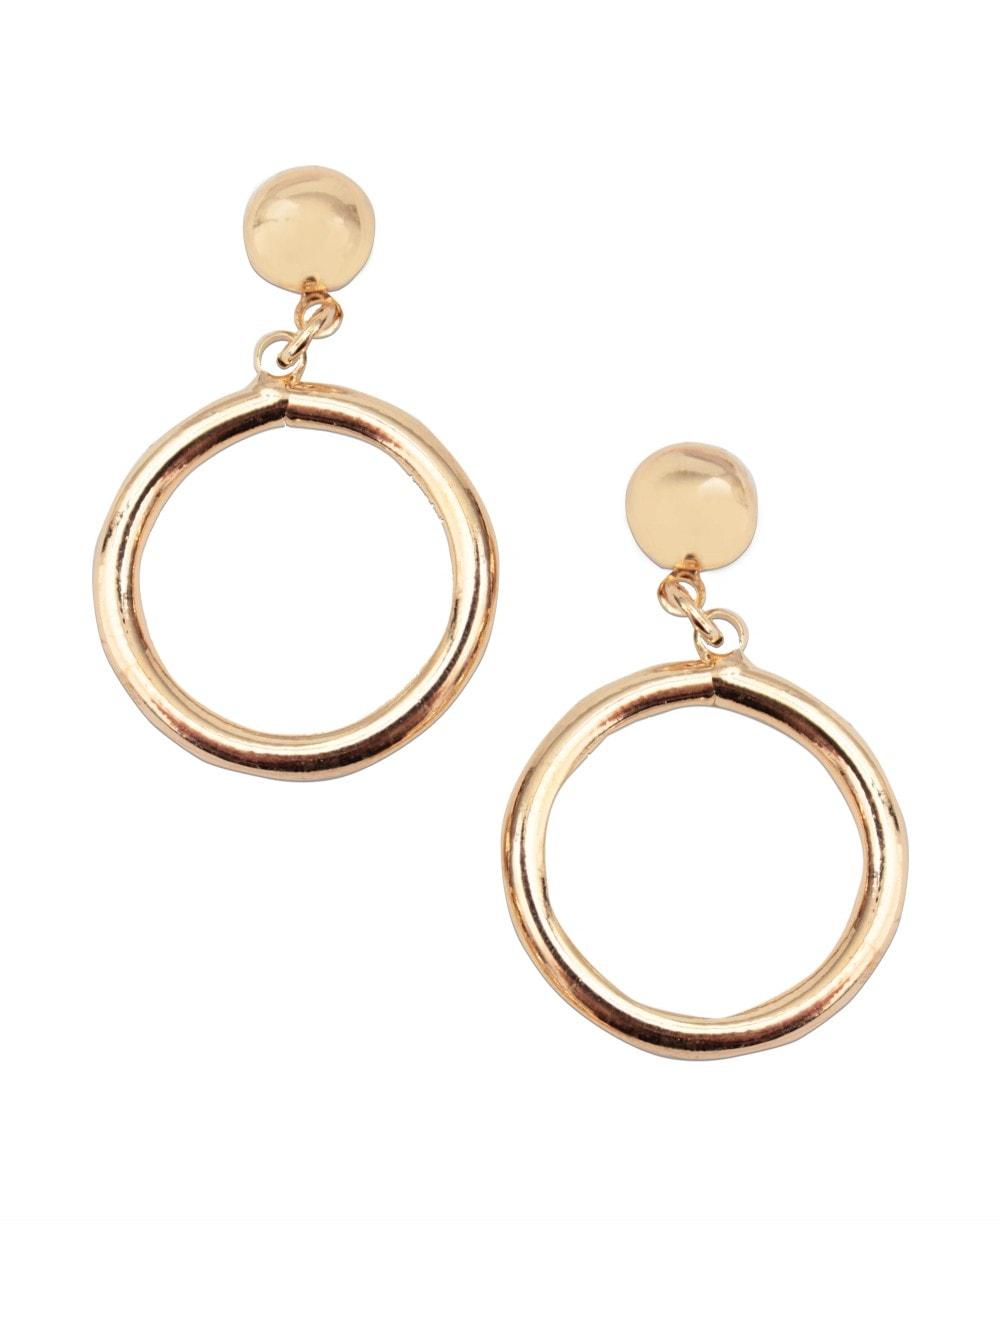 84429fbf4 Sweater girl mini drop hoop earrings - Gold from Vivien of Holloway